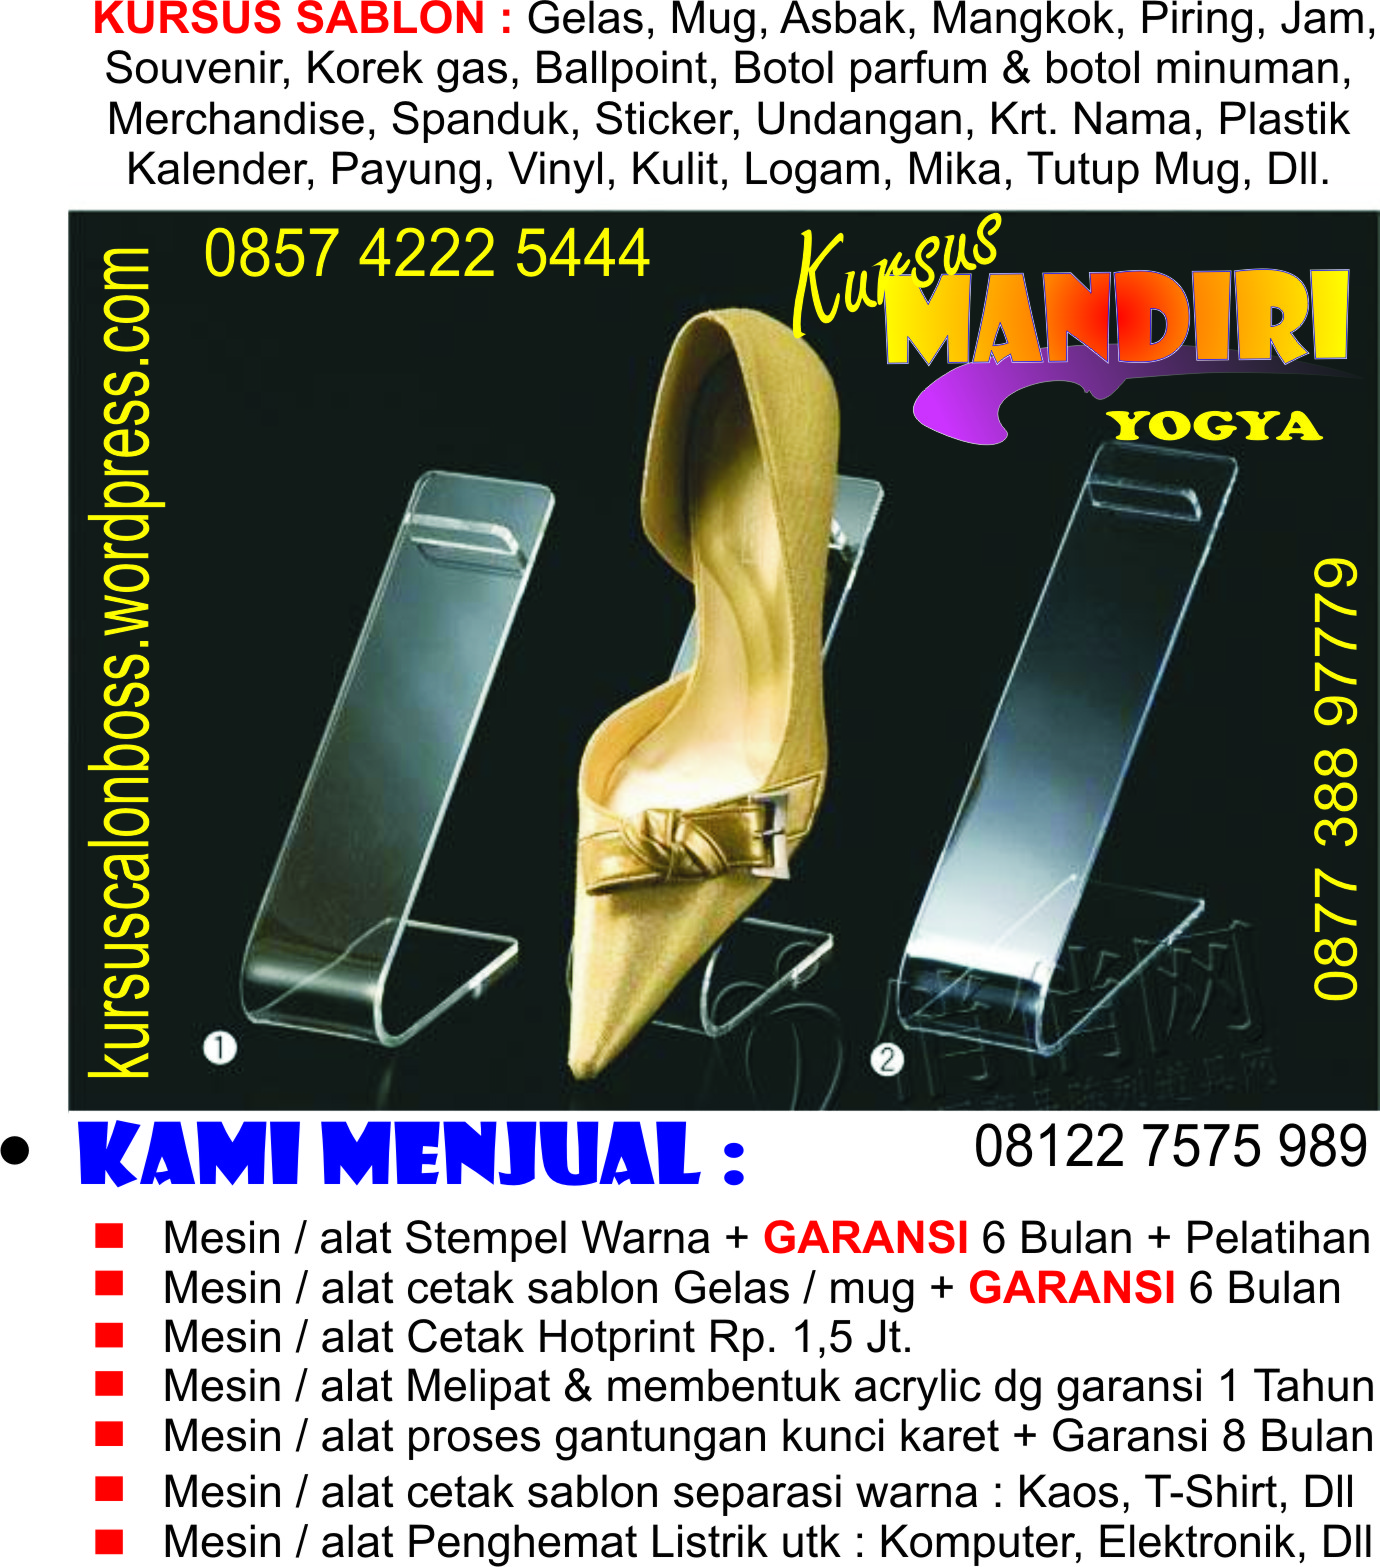 Lowongan Bank Bukopin Malang Lowongan Kerja Di Surabaya Agustus 2016 Surabayajobfair Kami Spesial Website Pusat Kursus Cetak Offset Jilid Binding